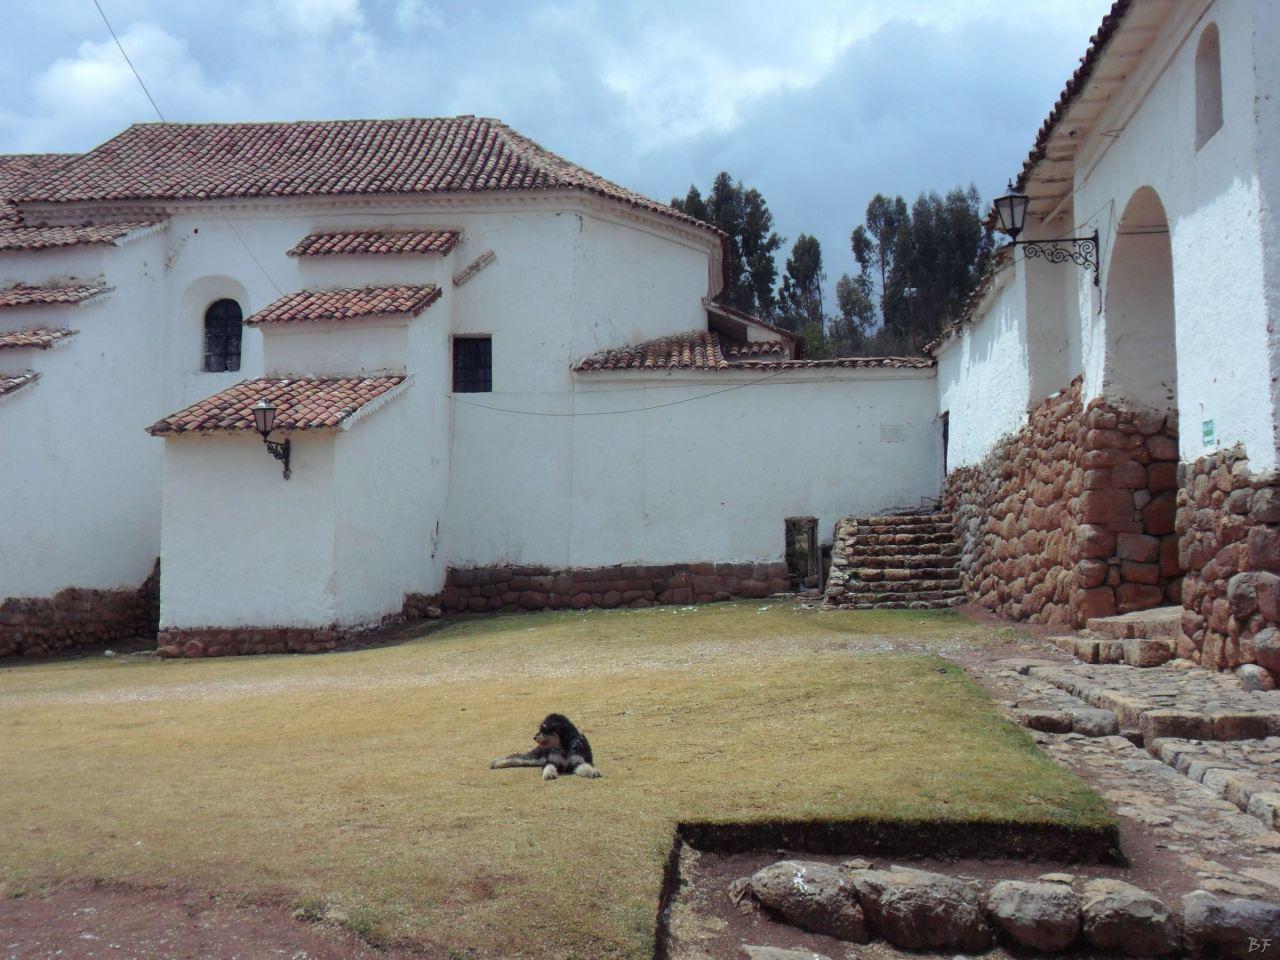 Chinchero-Mura-Poligonali-Piramide-Urubamba-Peru-9